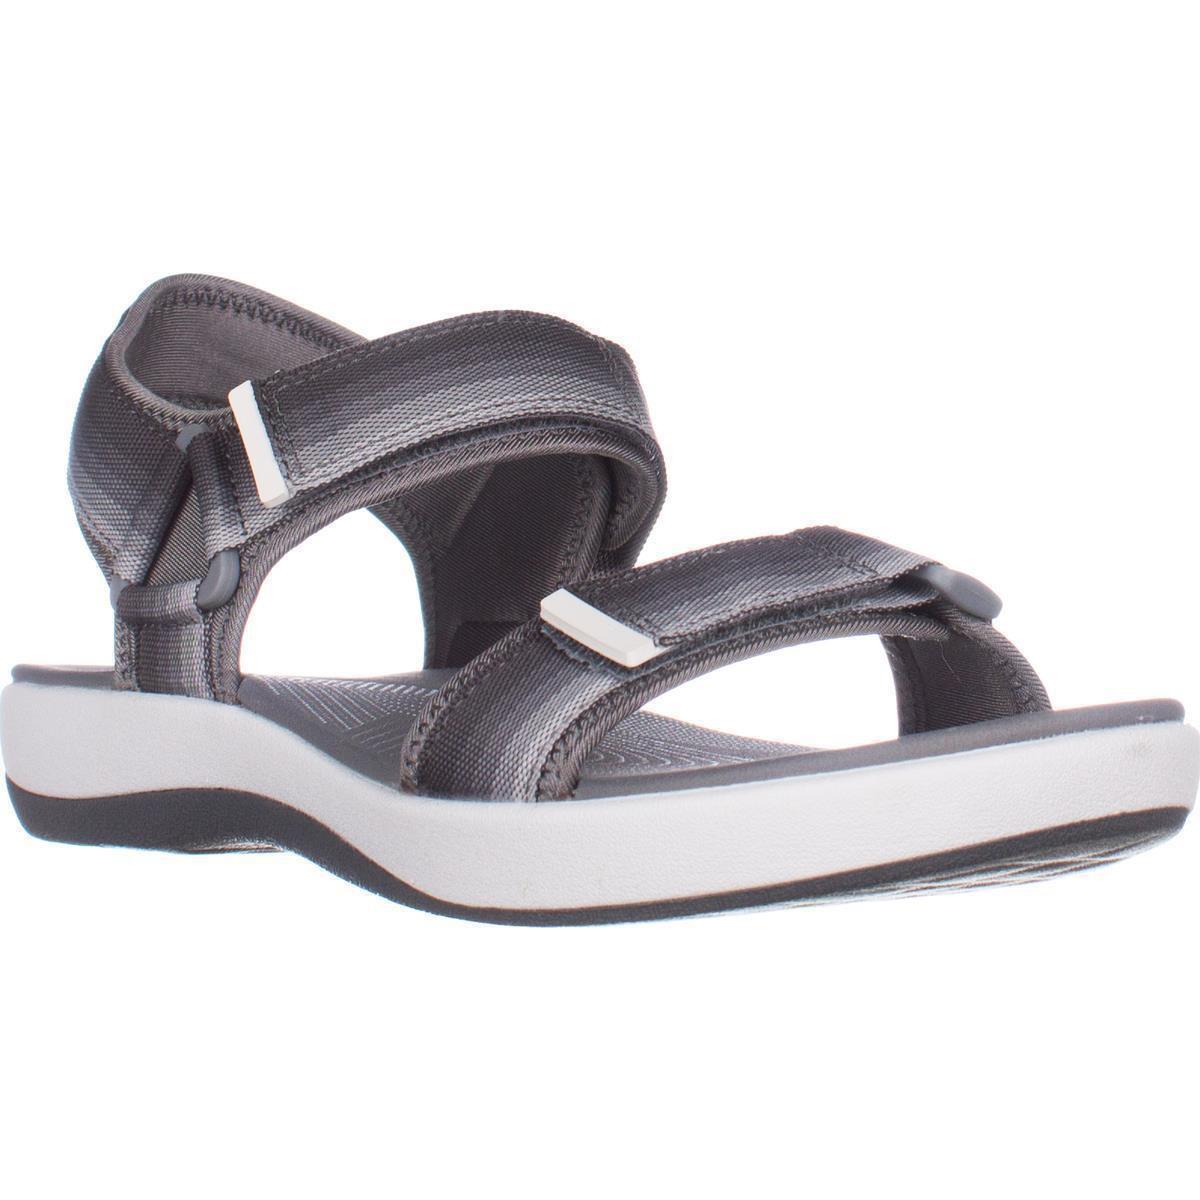 5fa0451f9d83 Clarks Brizo Ravena Cloudsteppers Flats Sandals - Grey in Gray - Lyst